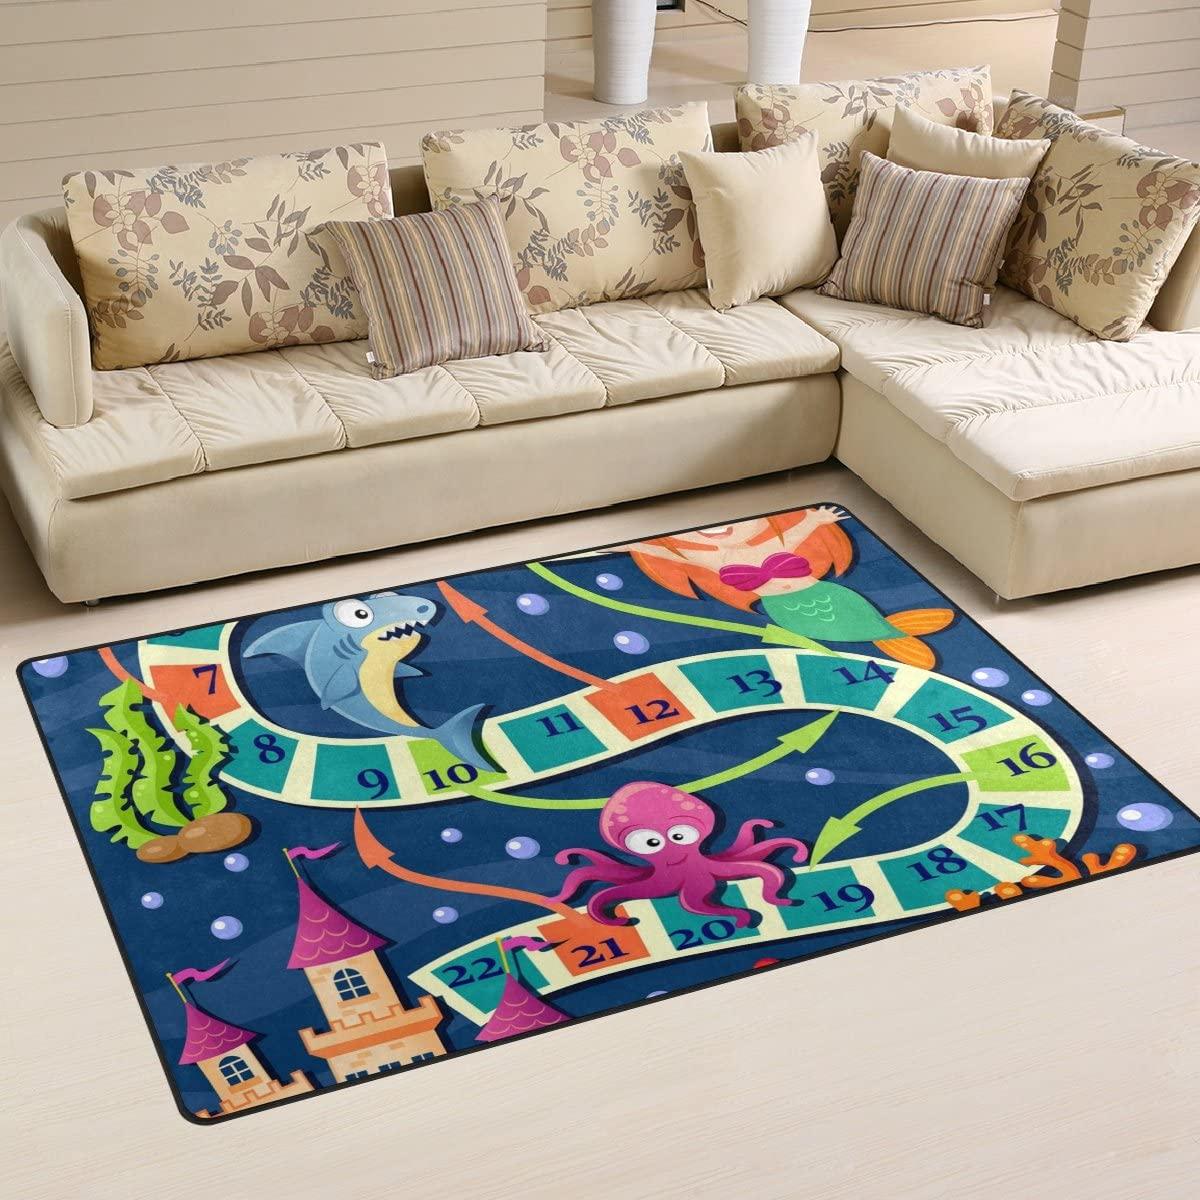 WellLee Area Rug,Board Game Mermaid Sea Animals Floor Rug Non-Slip Doormat for Living Dining Dorm Room Bedroom Decor 31x20 Inch